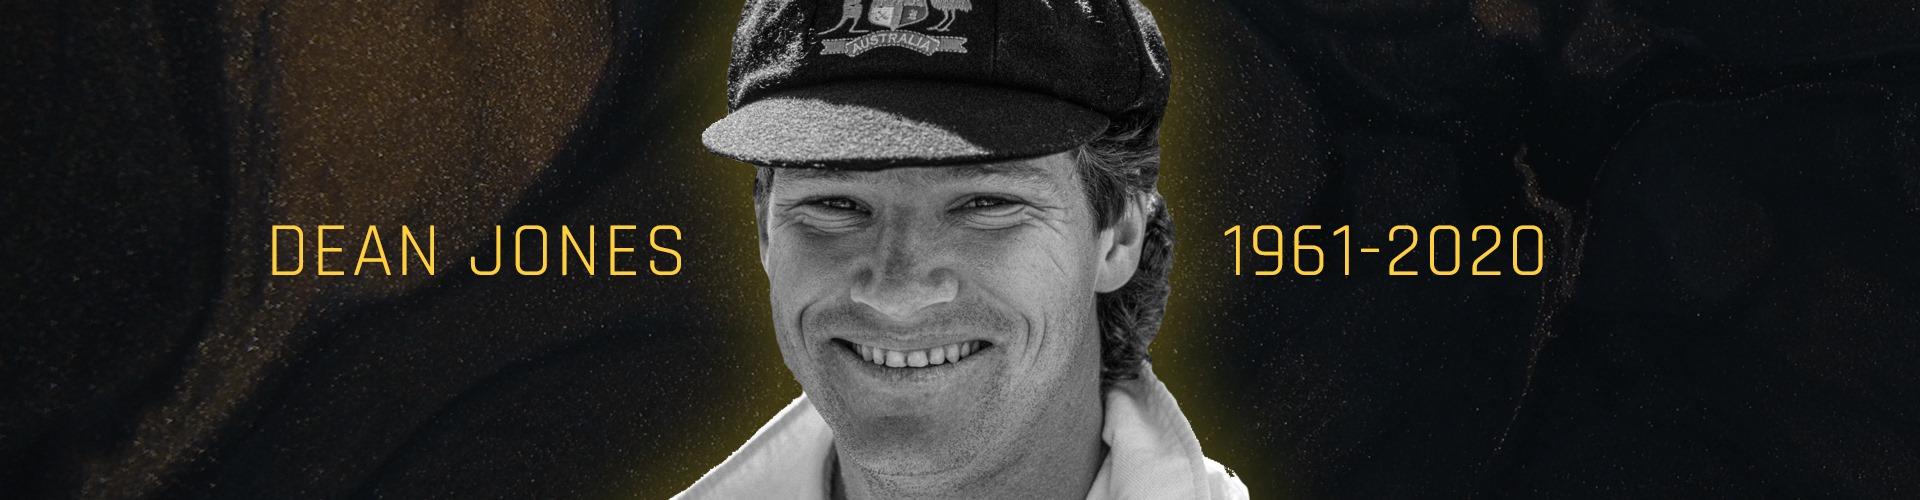 Dean Jones, Cricketer, Commentator, Cricket